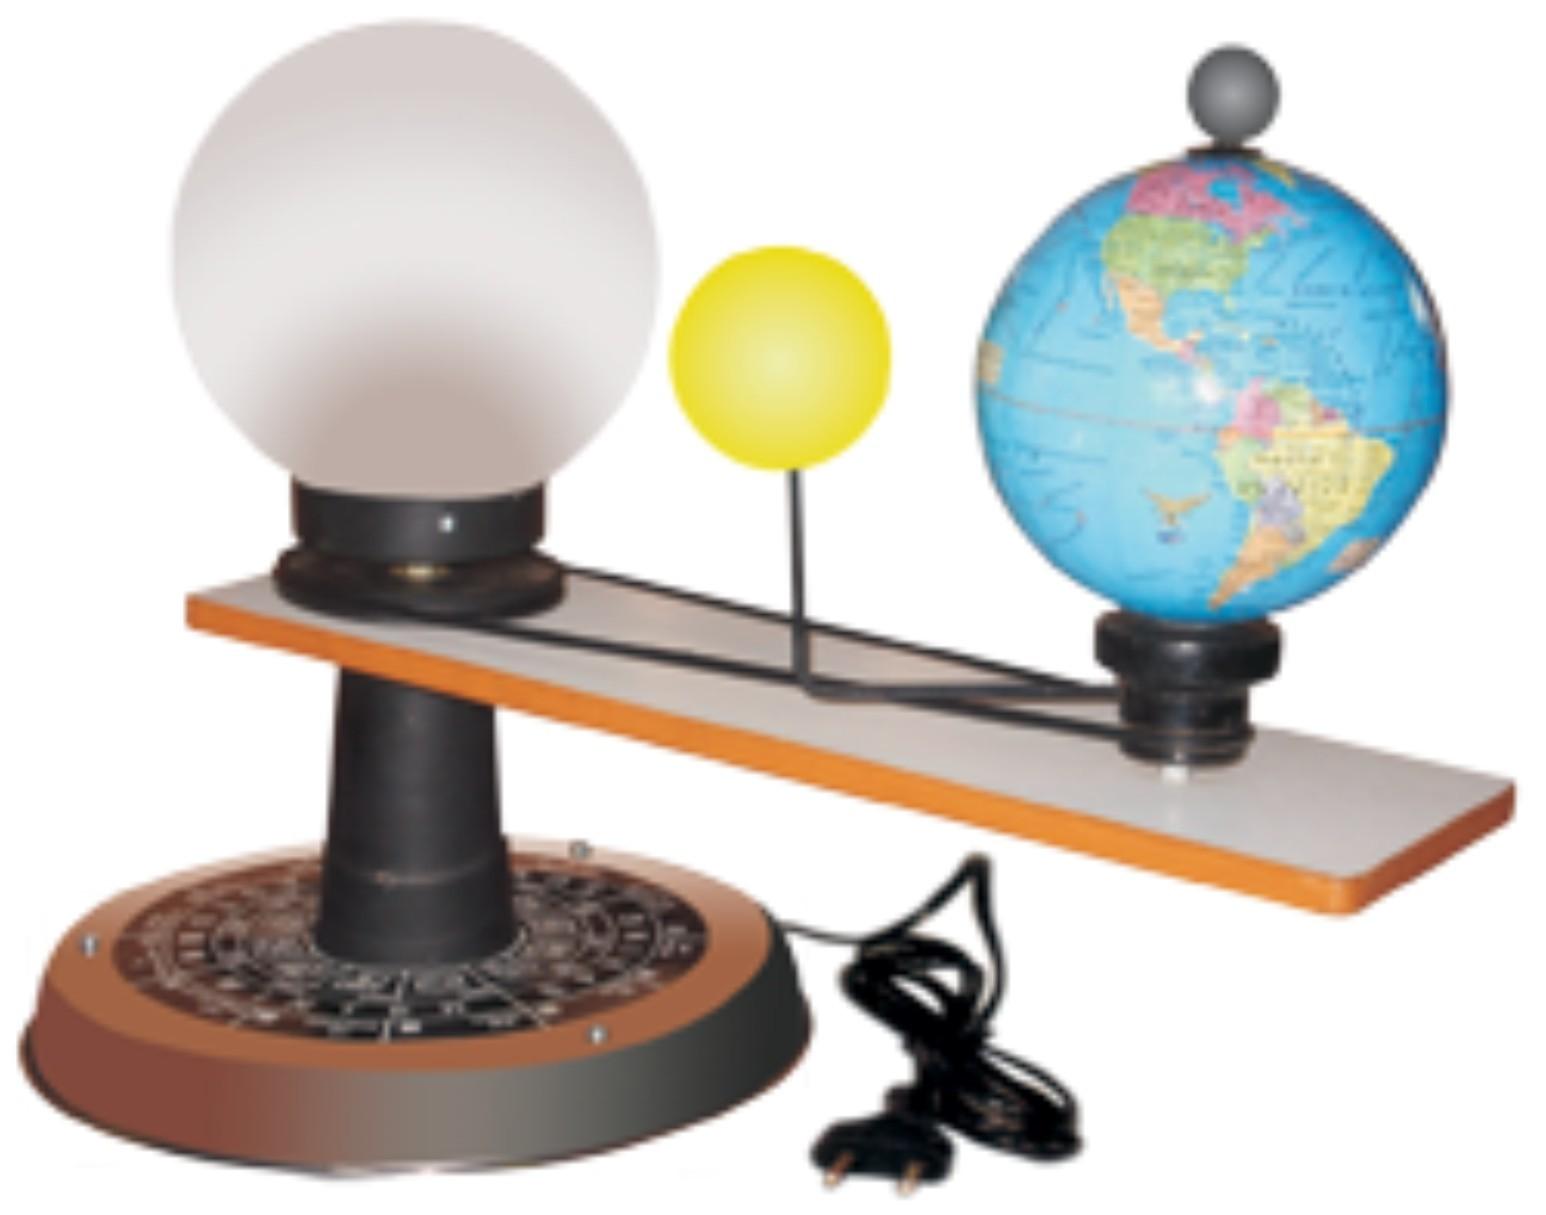 Solar & Lunar Eclipse Apparatus